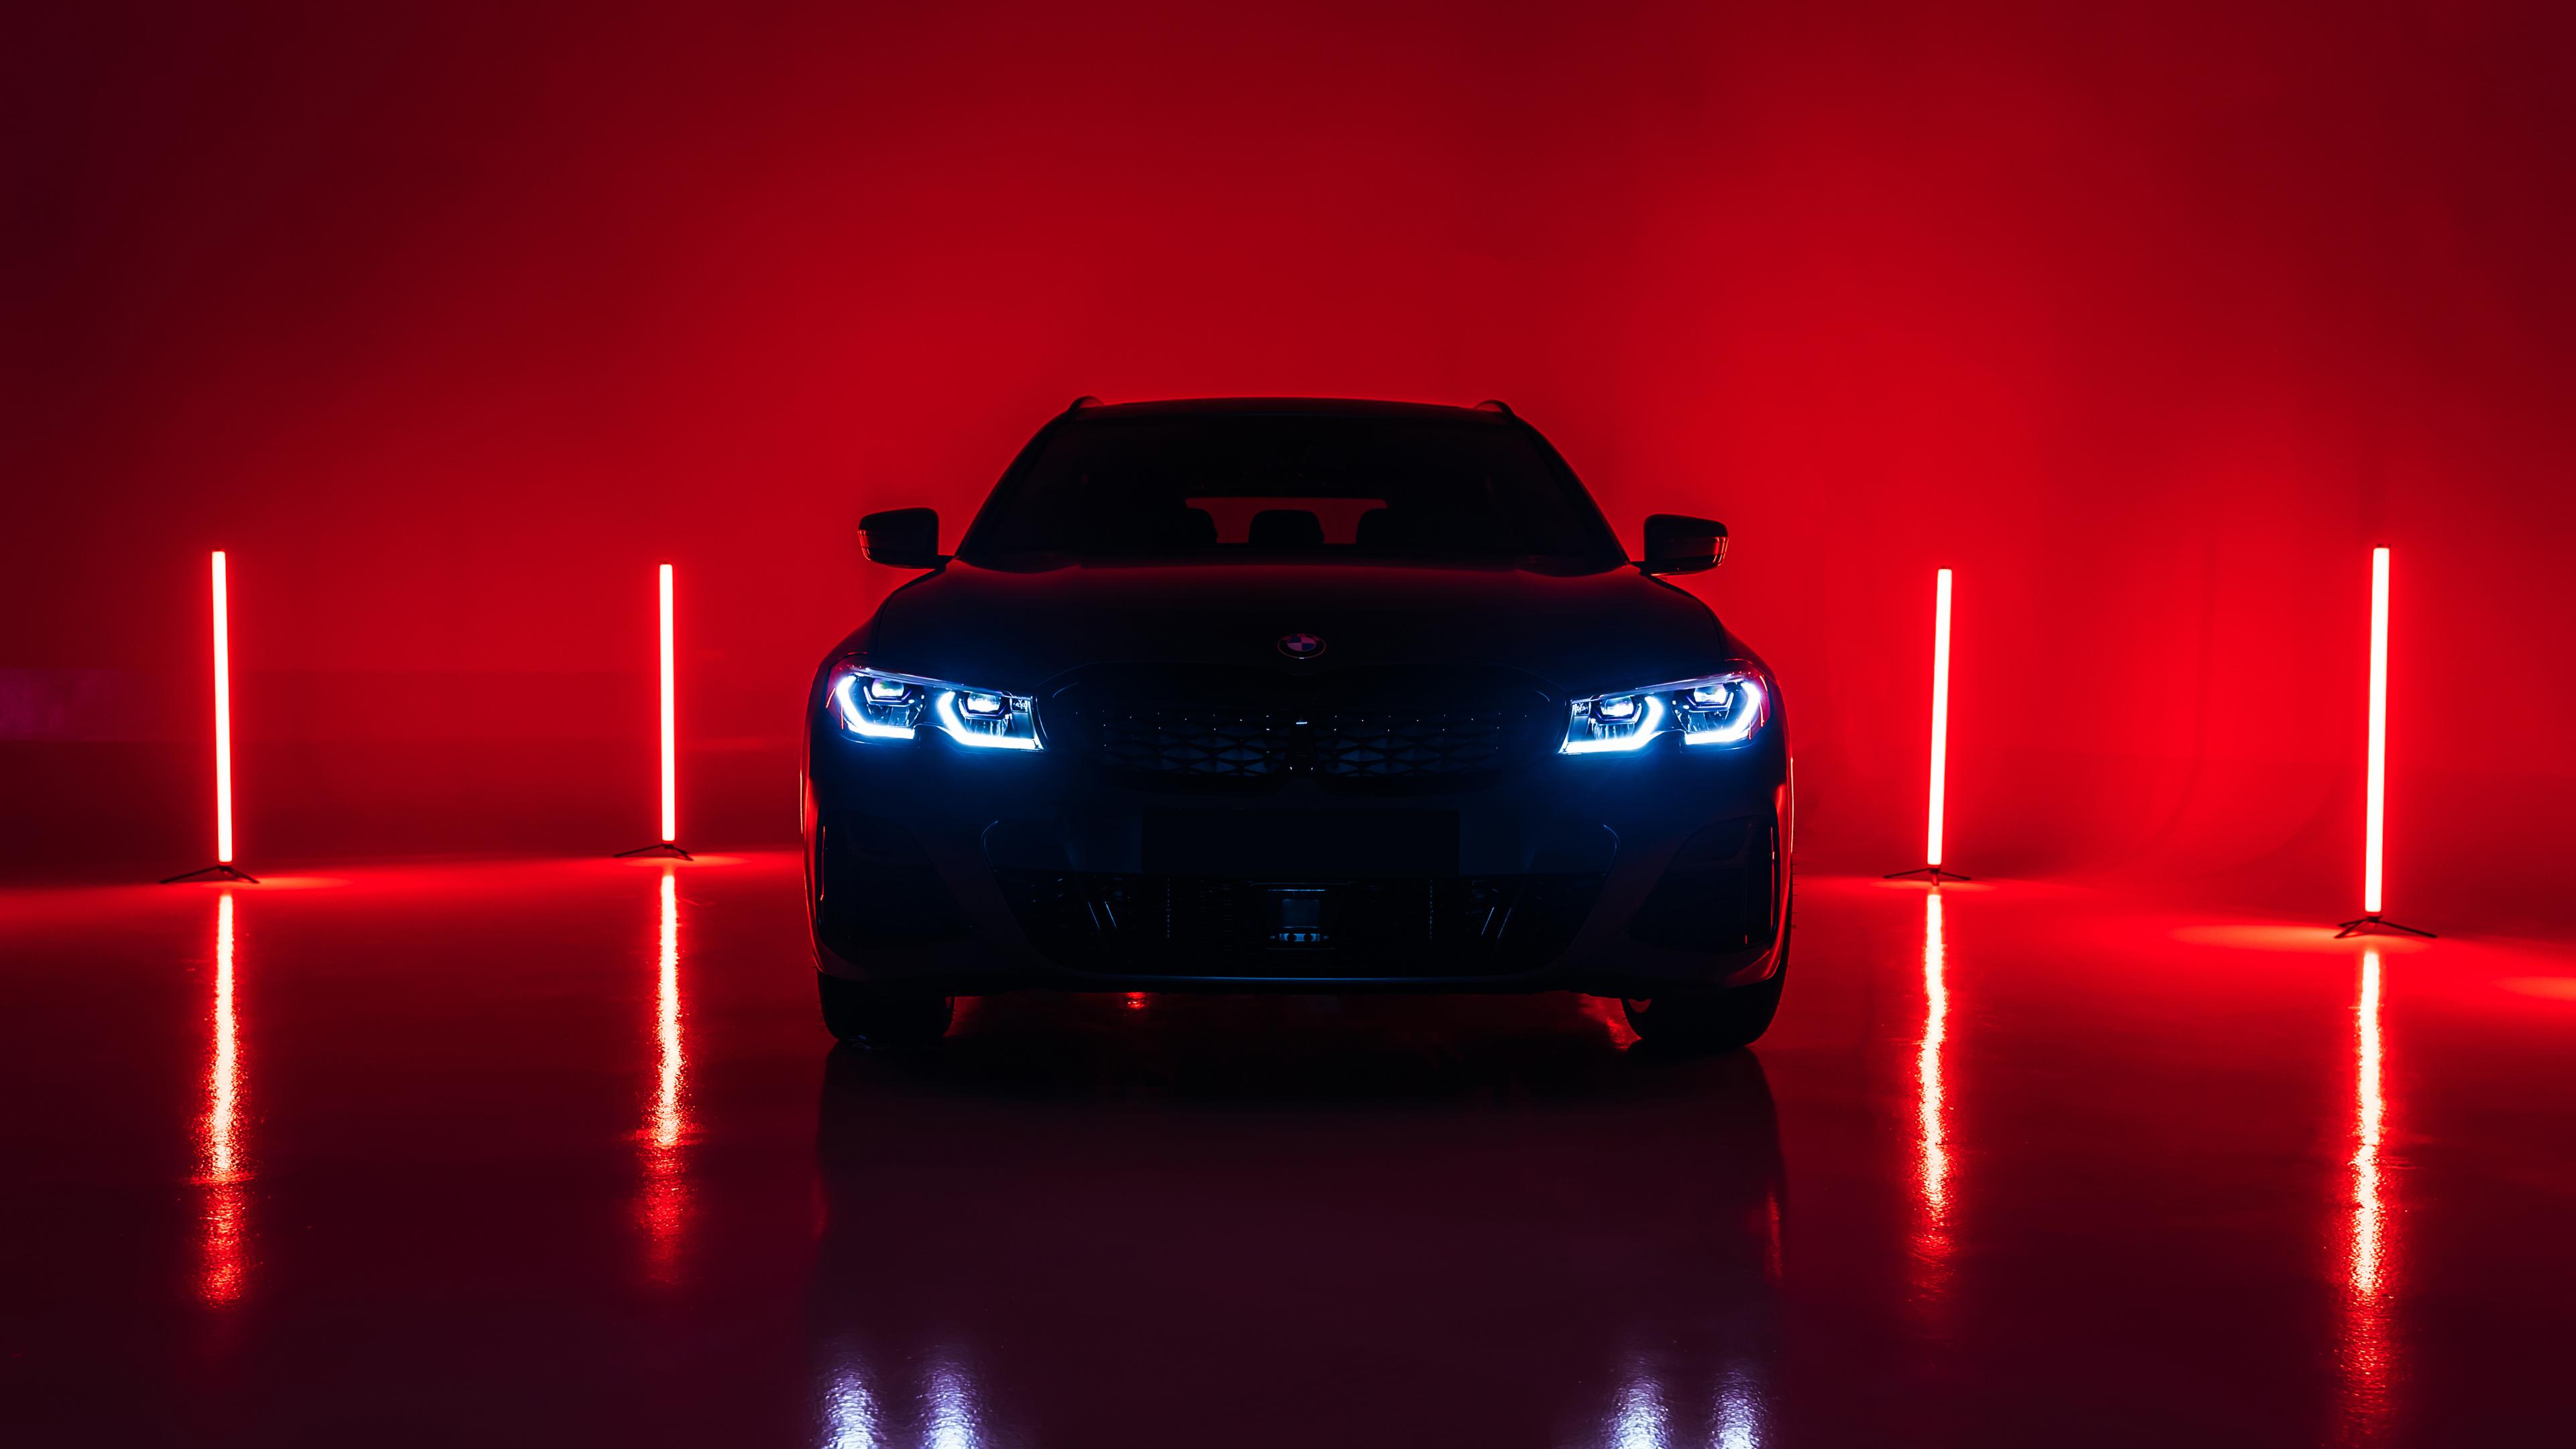 General 3840x2160 BMW M340i vehicle car low light Headlights red light reflection